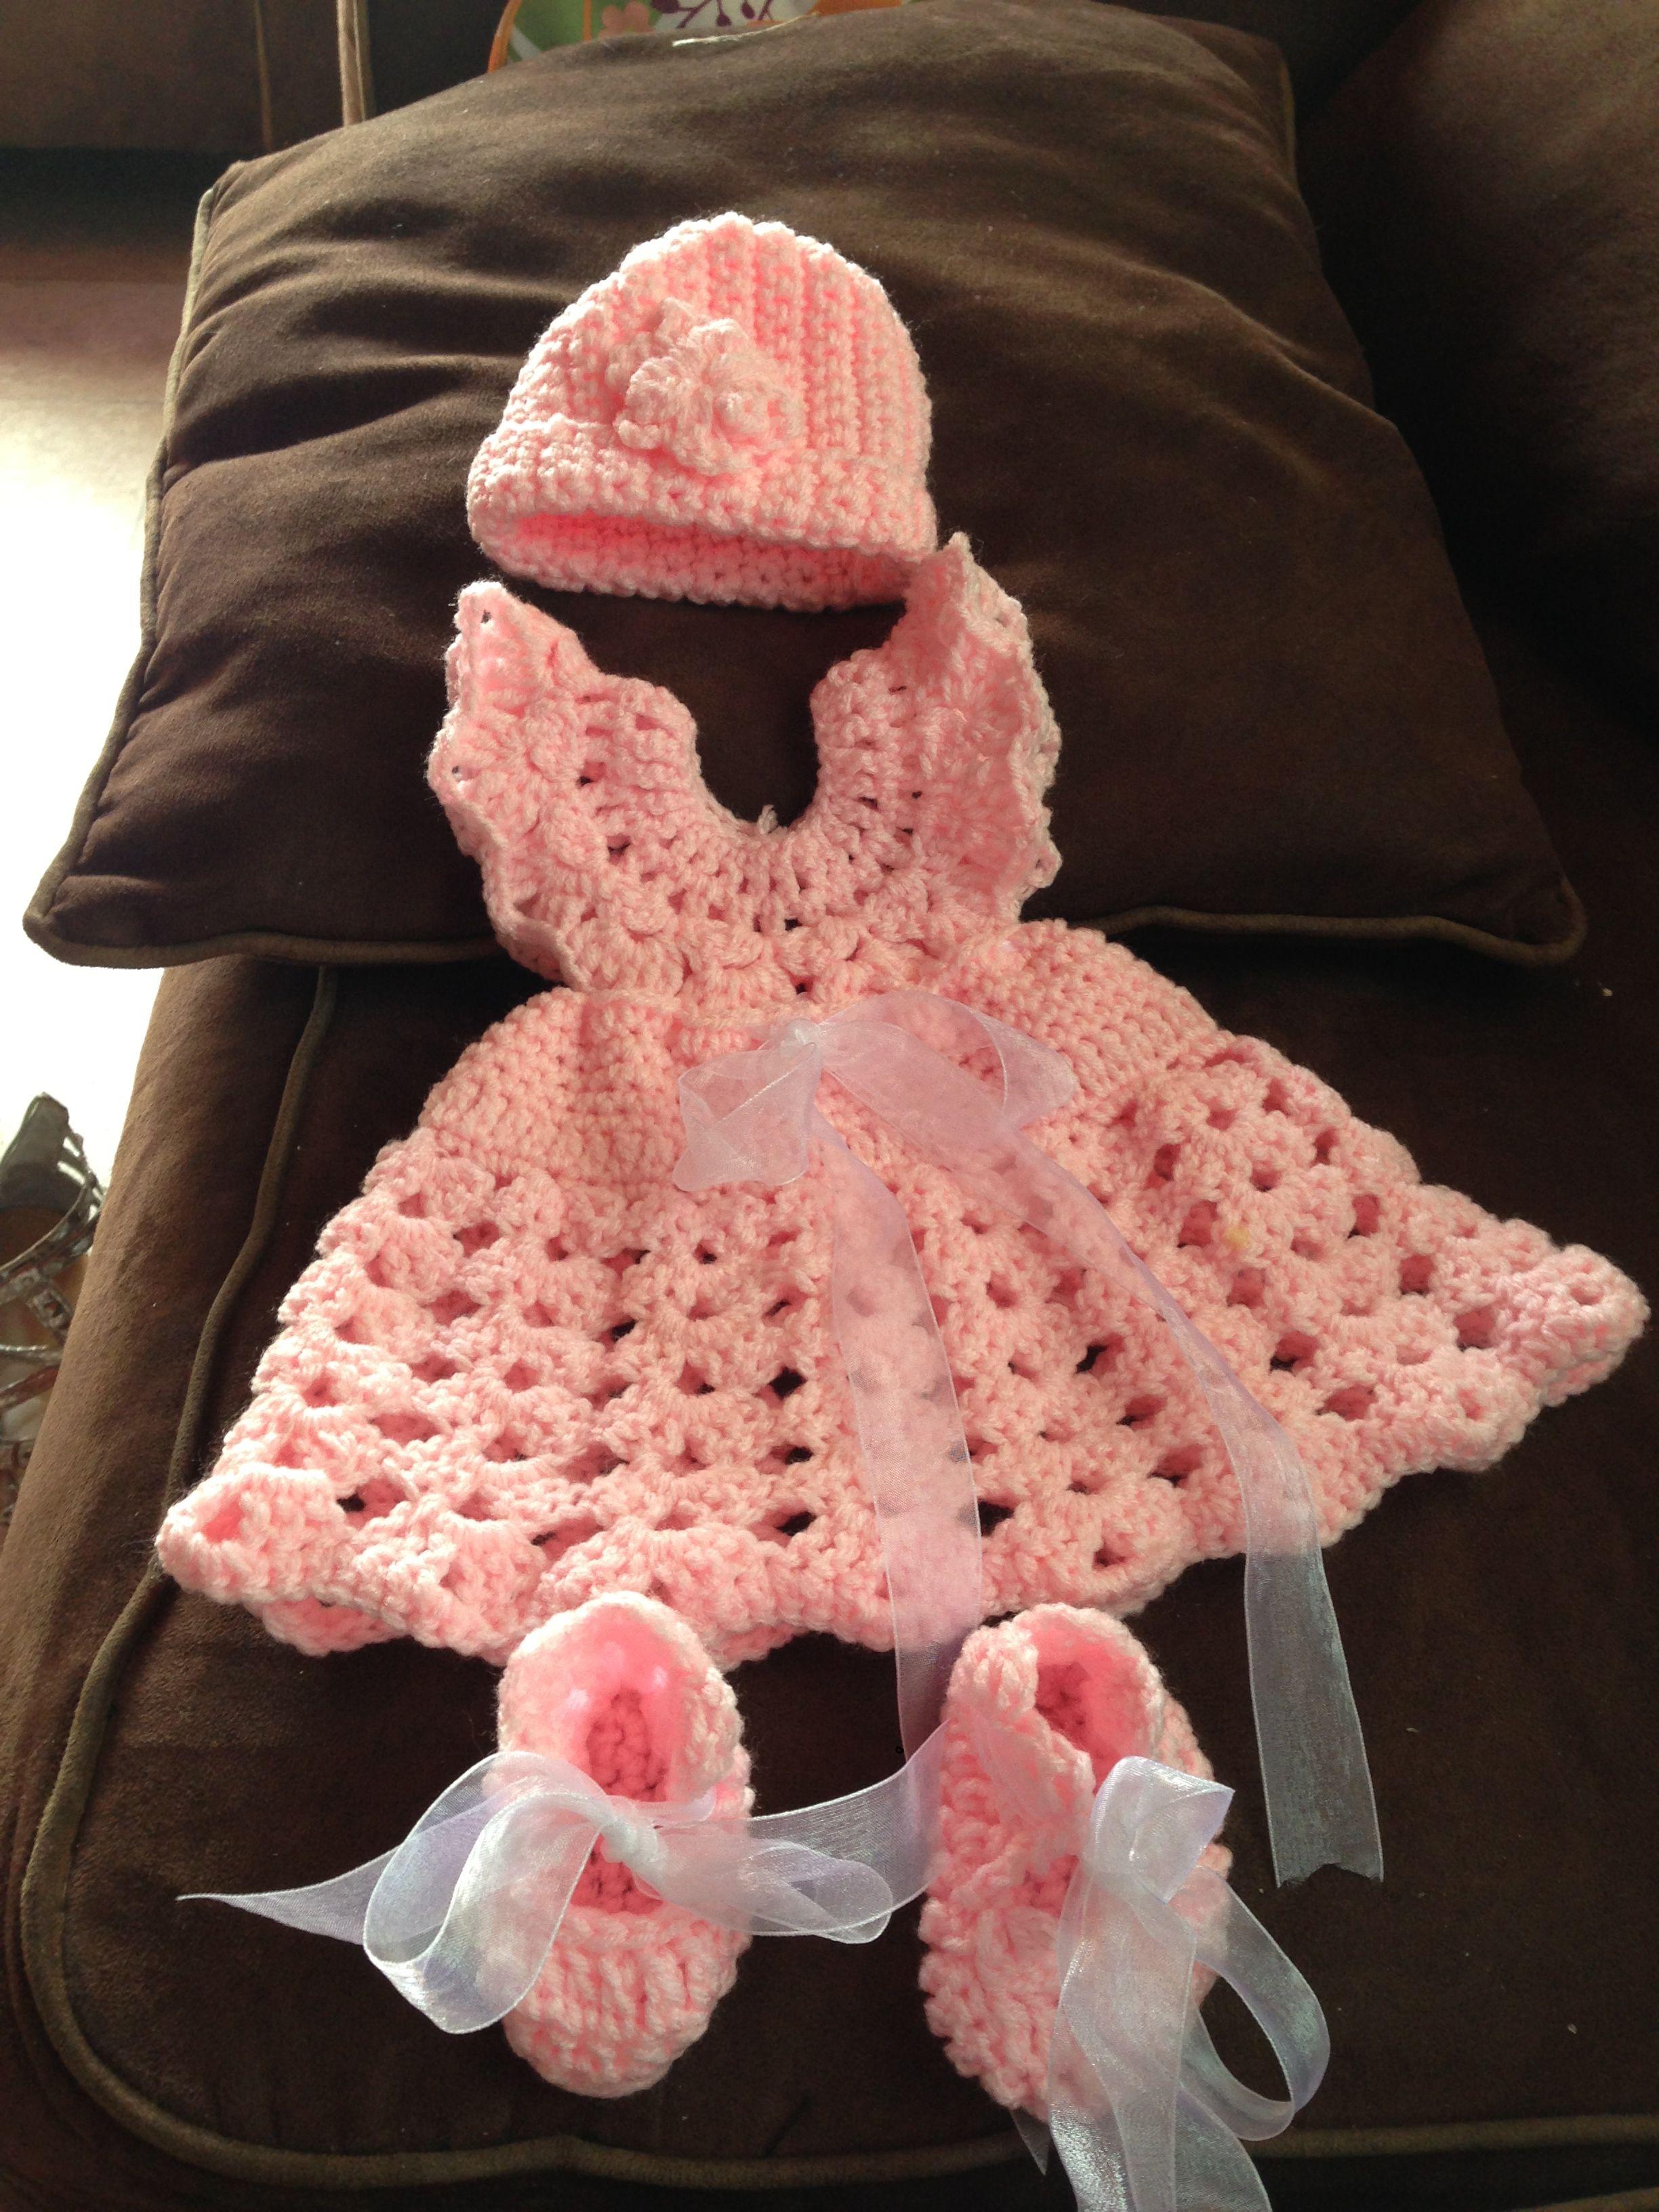 Crochet baby girl outfit   did it   Pinterest   Crochet ...